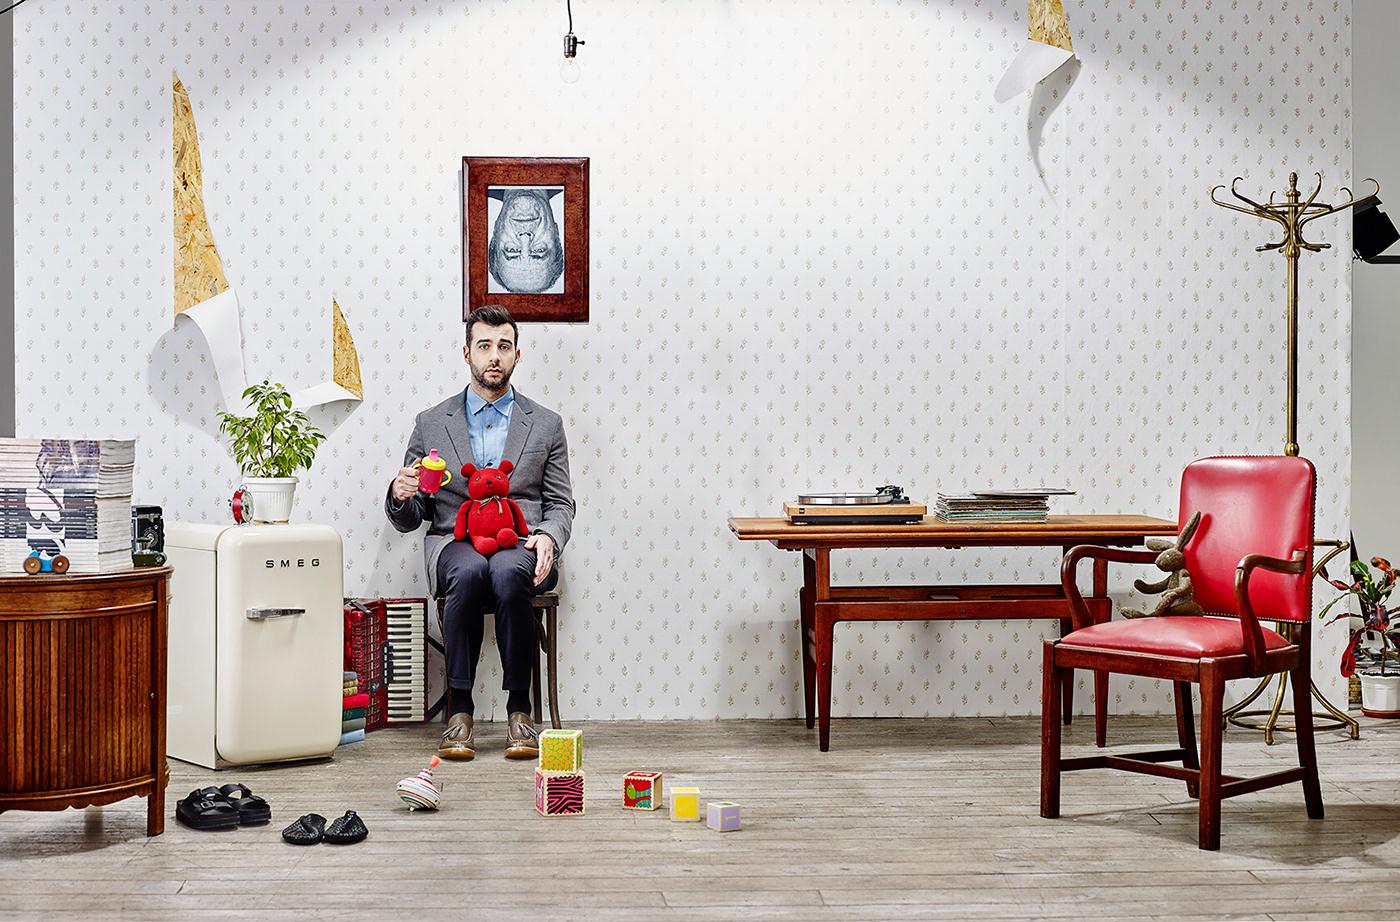 dmitry zhuravlev Photography  ivan urgant esquire russia